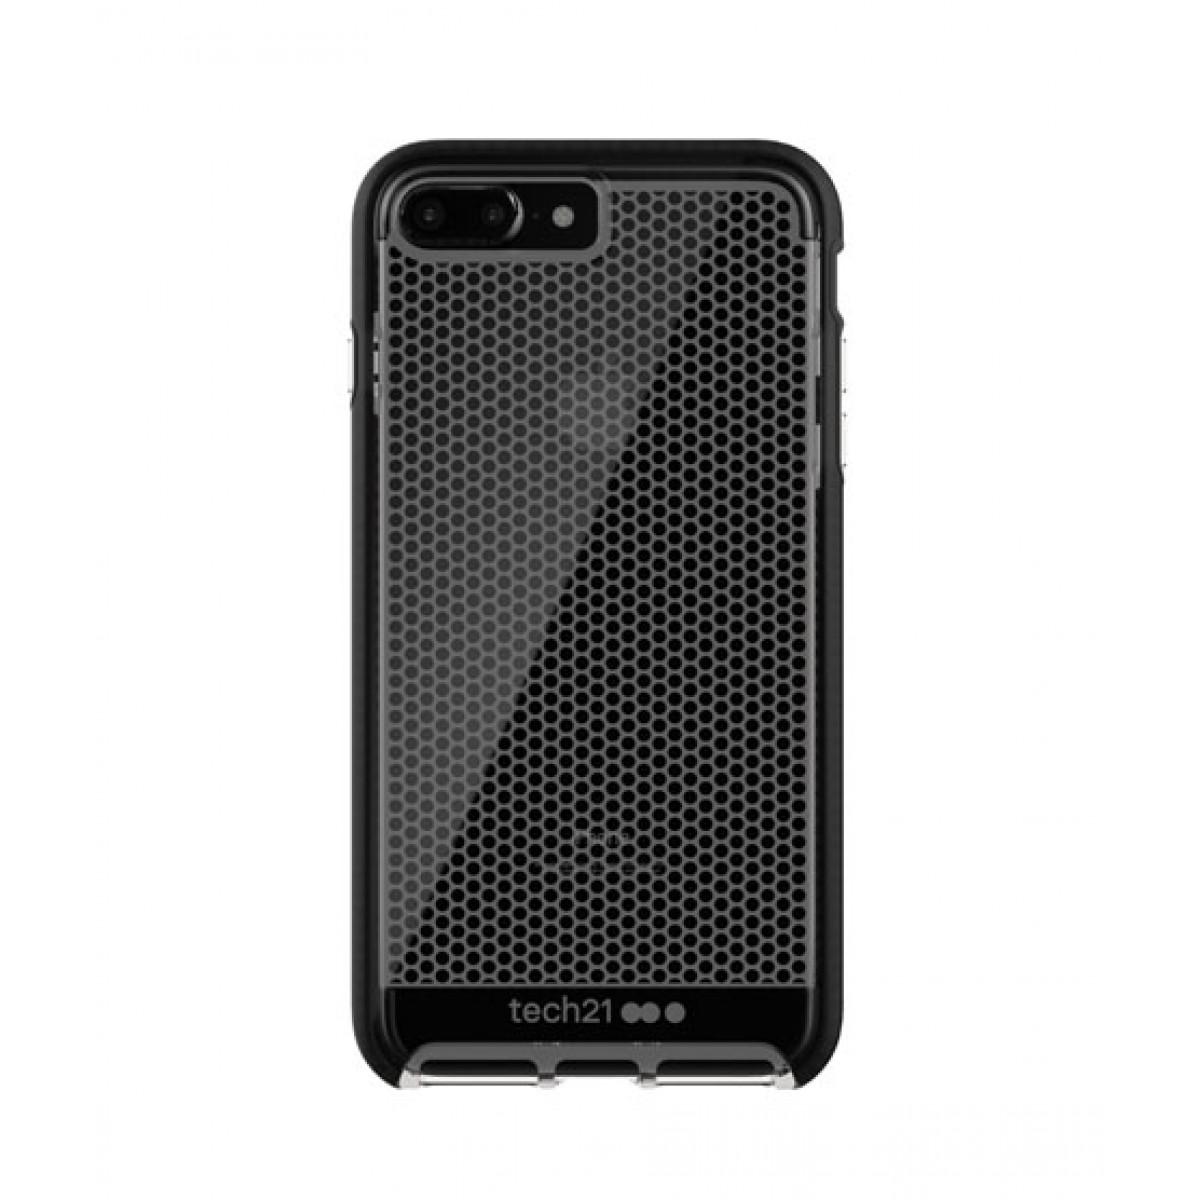 timeless design e20bb dbc75 Tech21 Evo Mesh Clear/Black Case For iPhone 8 Plus